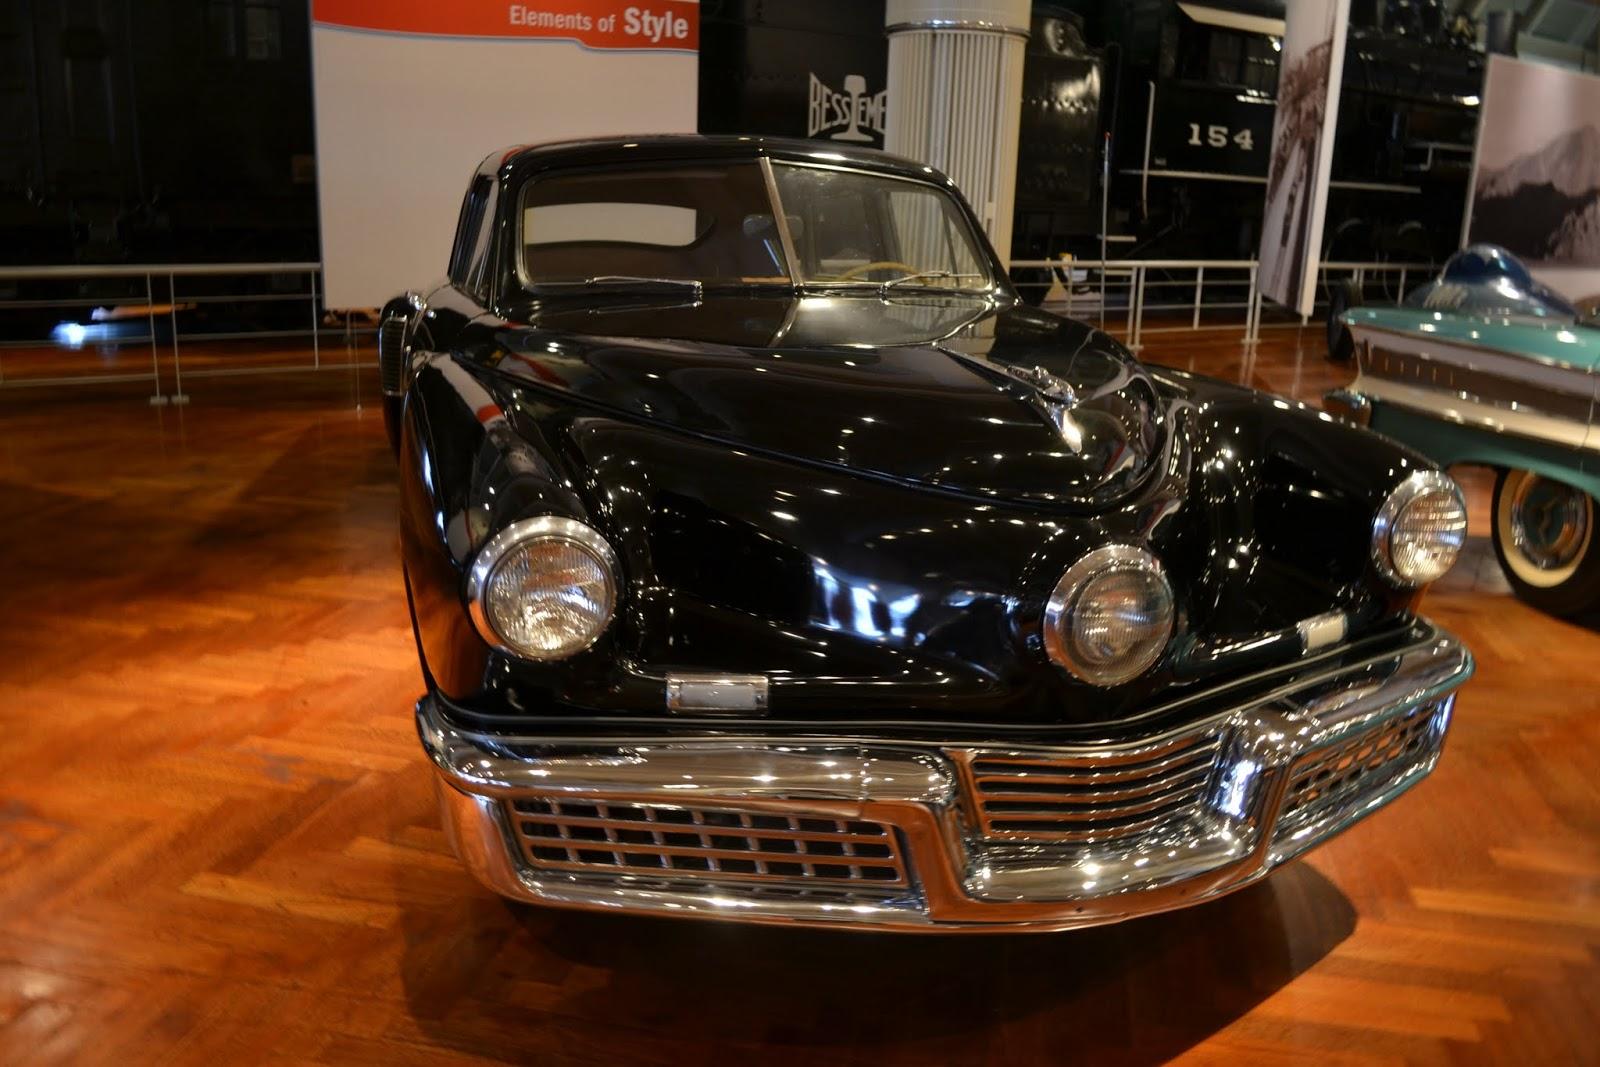 1948 Tucker 48. Музей Генри Форда. Дирборн, Мичиган (Henry Ford Museum, Dearborn, MI)